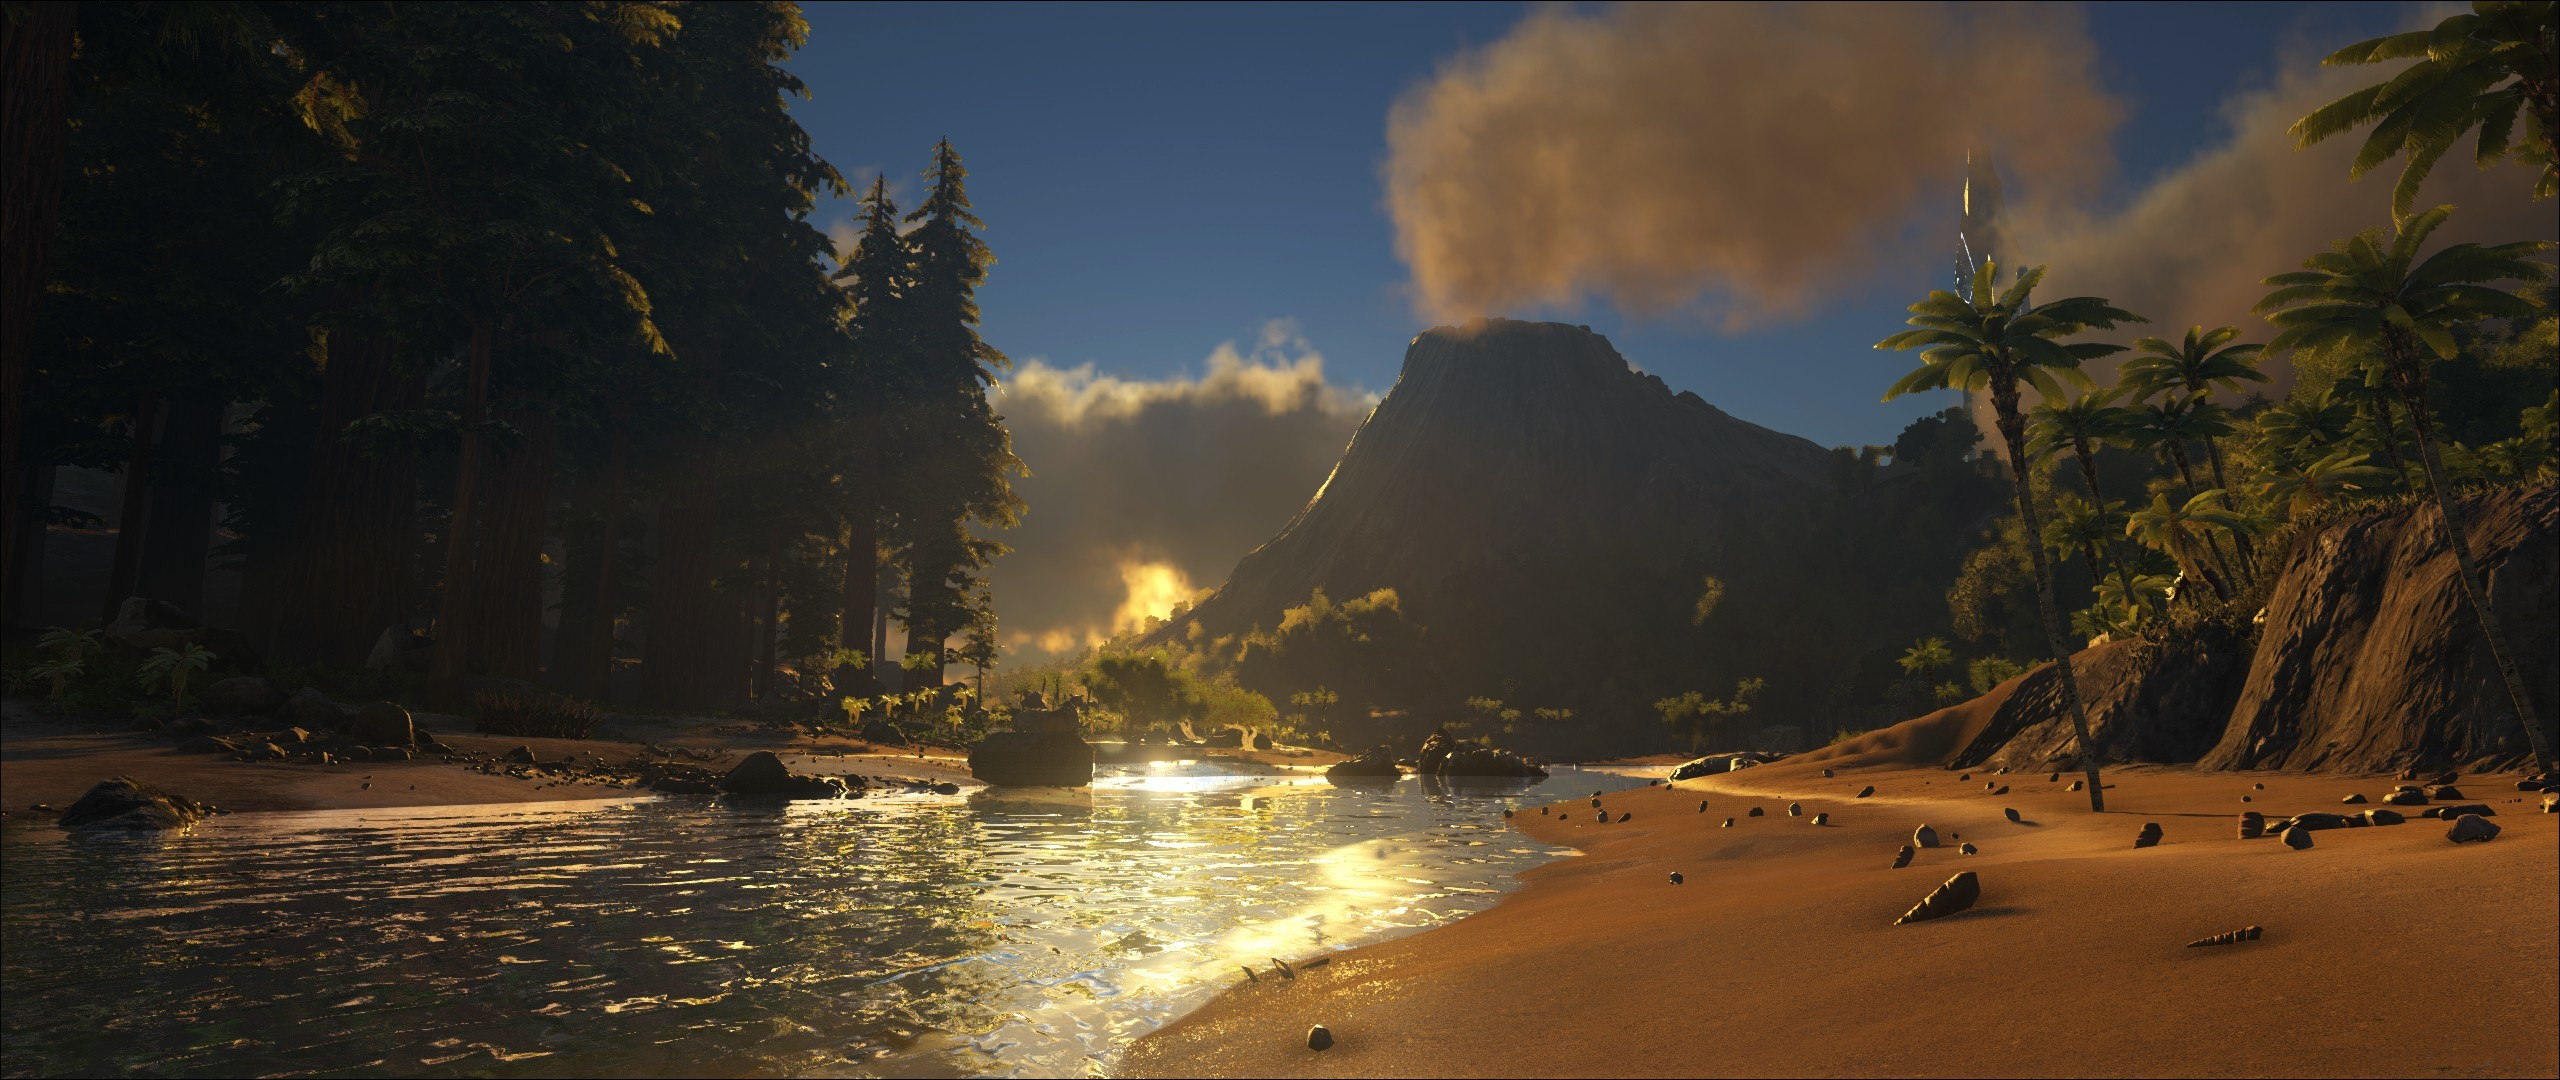 Res: 2560x1080, Video Game - ARK: Survival Evolved Wallpaper